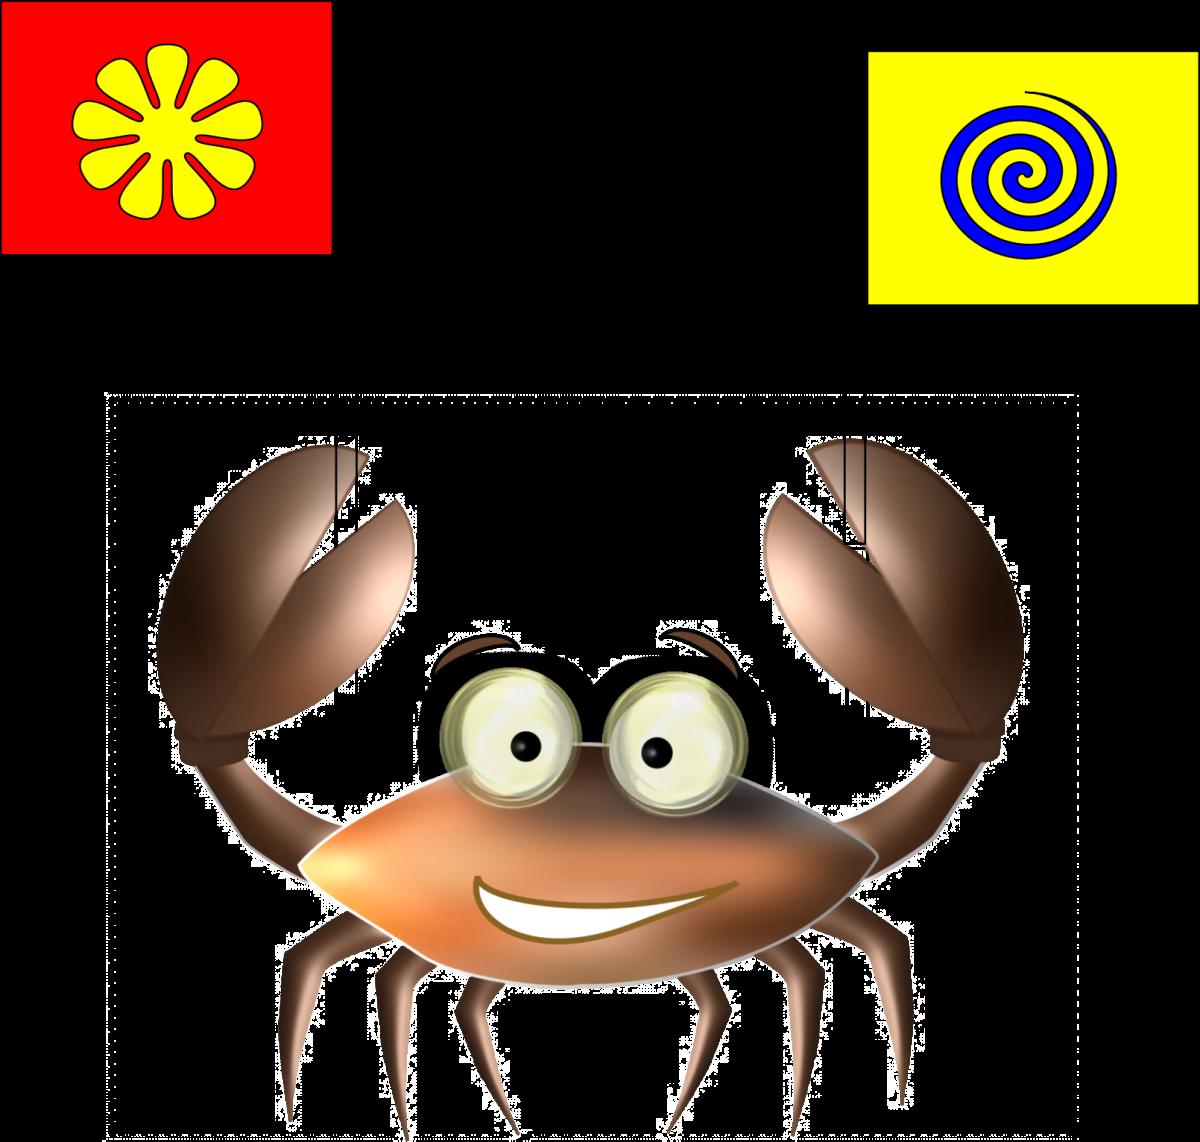 Semaphore is one method of communication